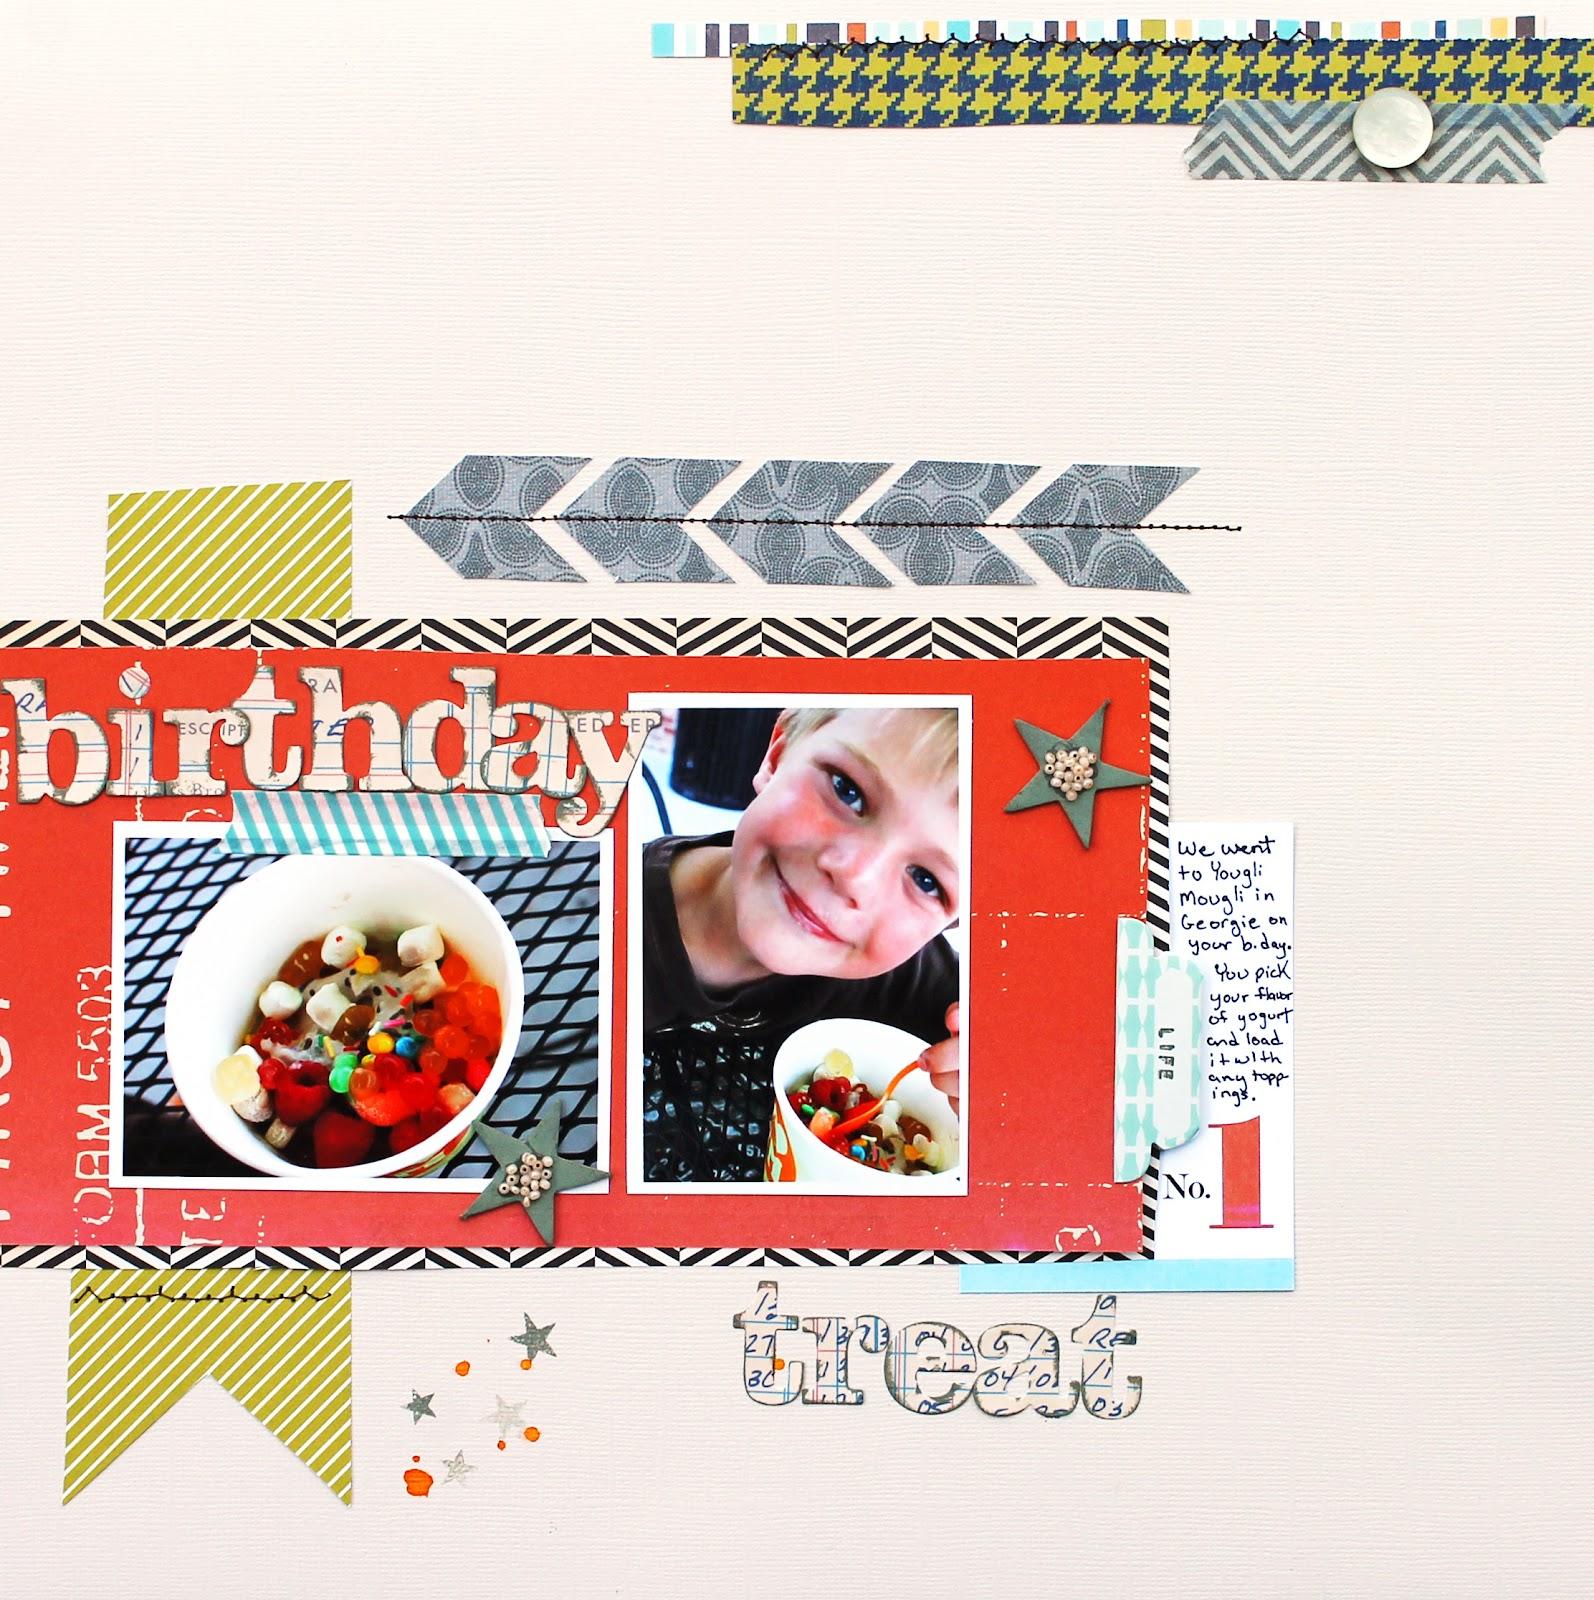 mylittleblessings birthday treat